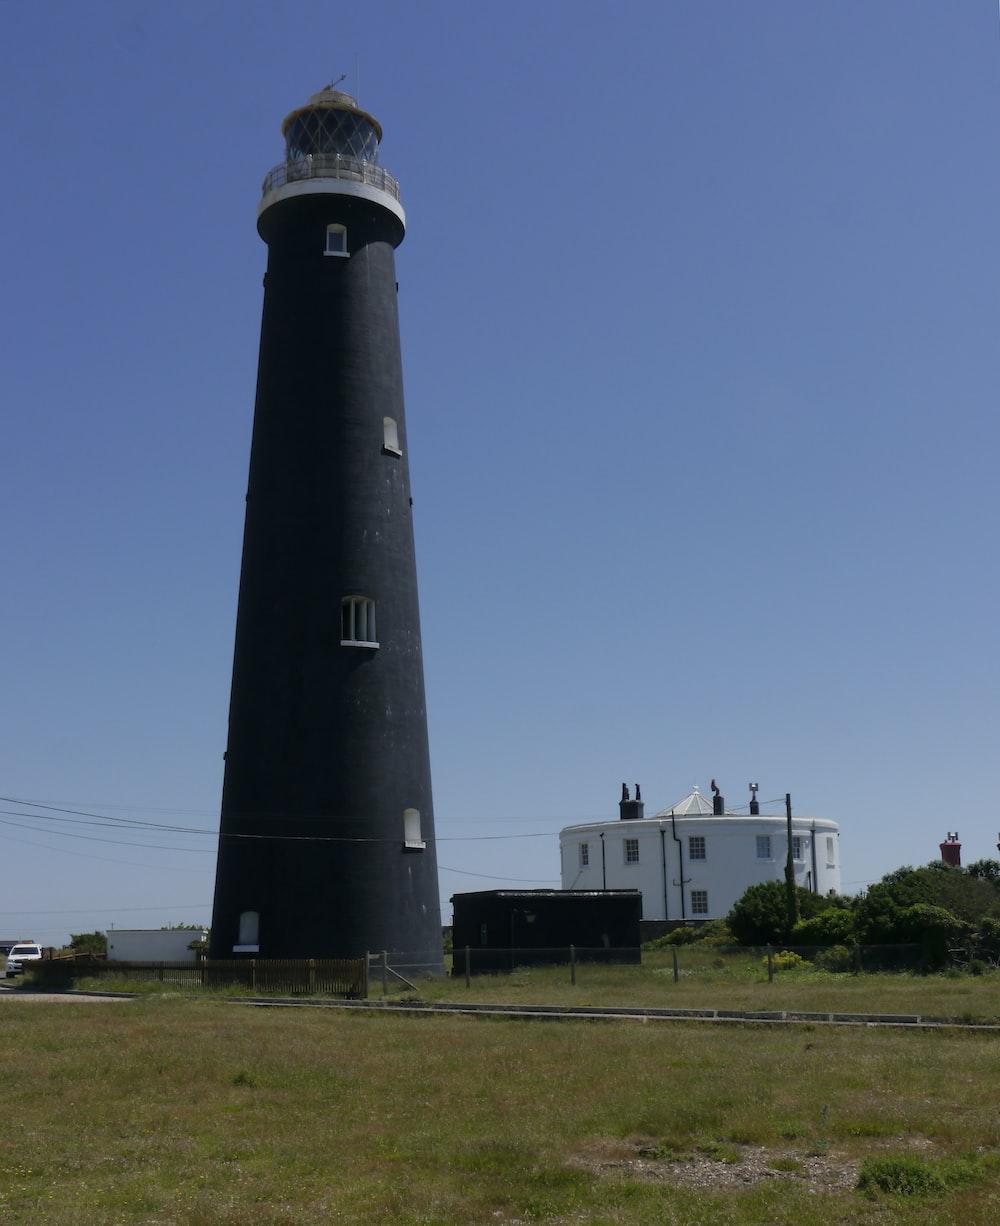 black and white lighthouse under blue sky during daytime